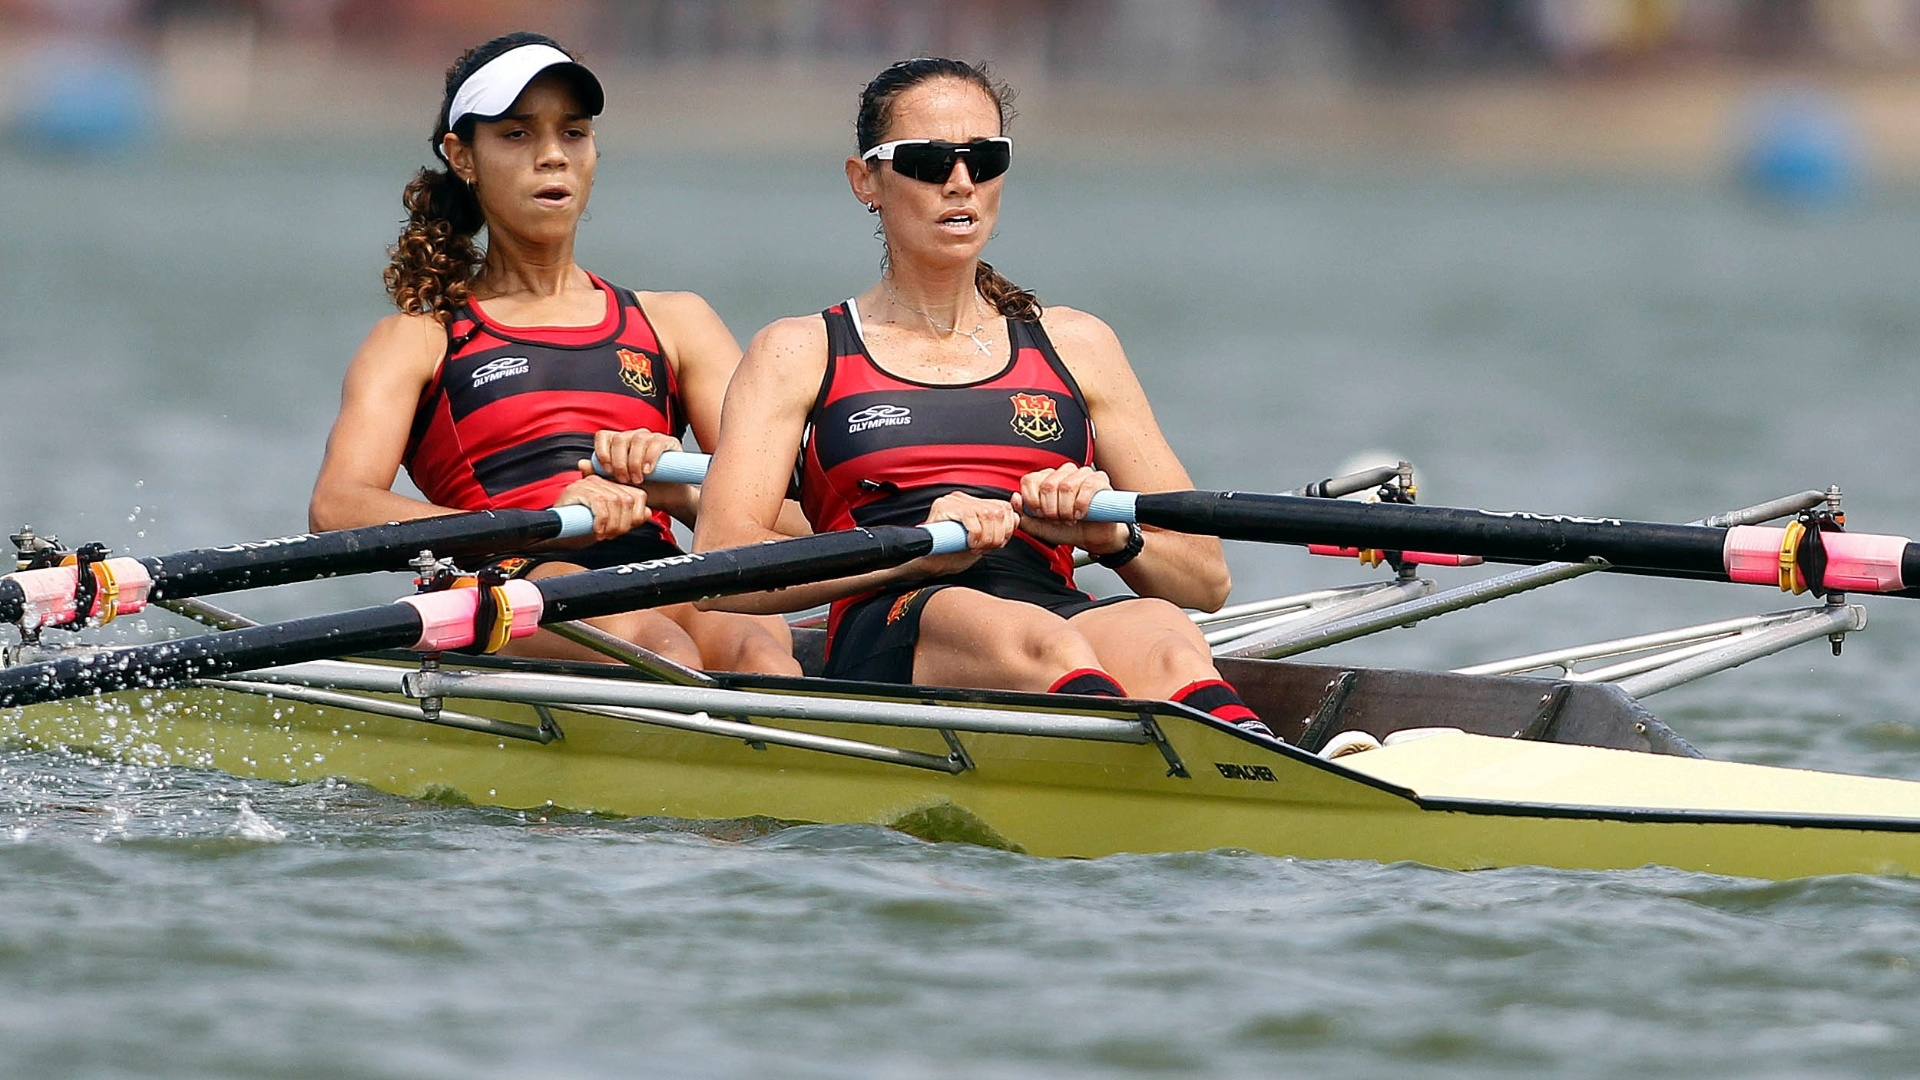 Luana Bartholo e Fabiana Beltrame buscarão uma vaga na Olimpíada-2012 no skiff duplo leve